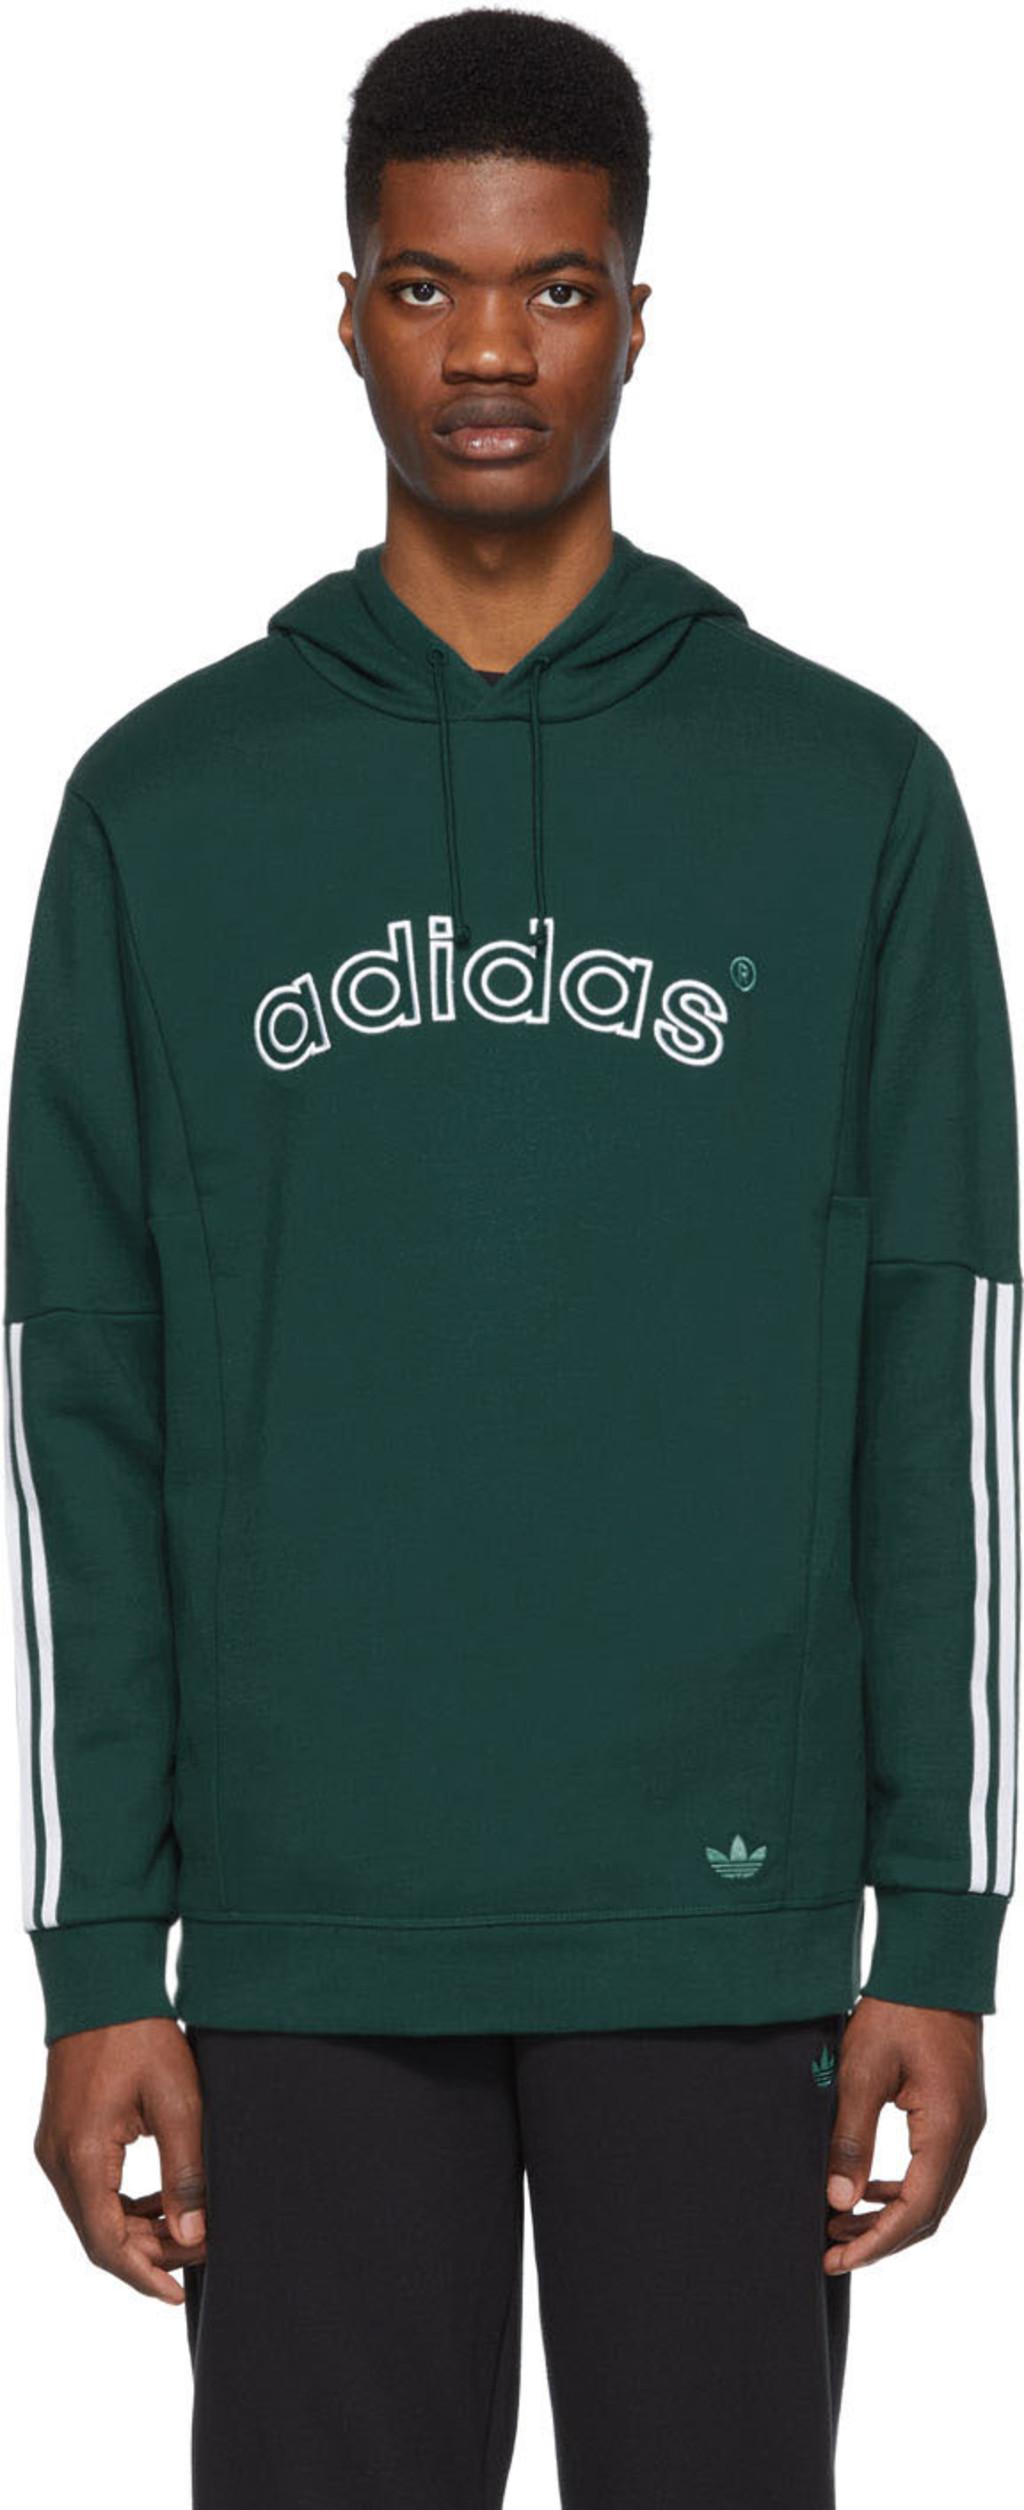 21cbd07eea516 Adidas Originals for Men SS19 Collection